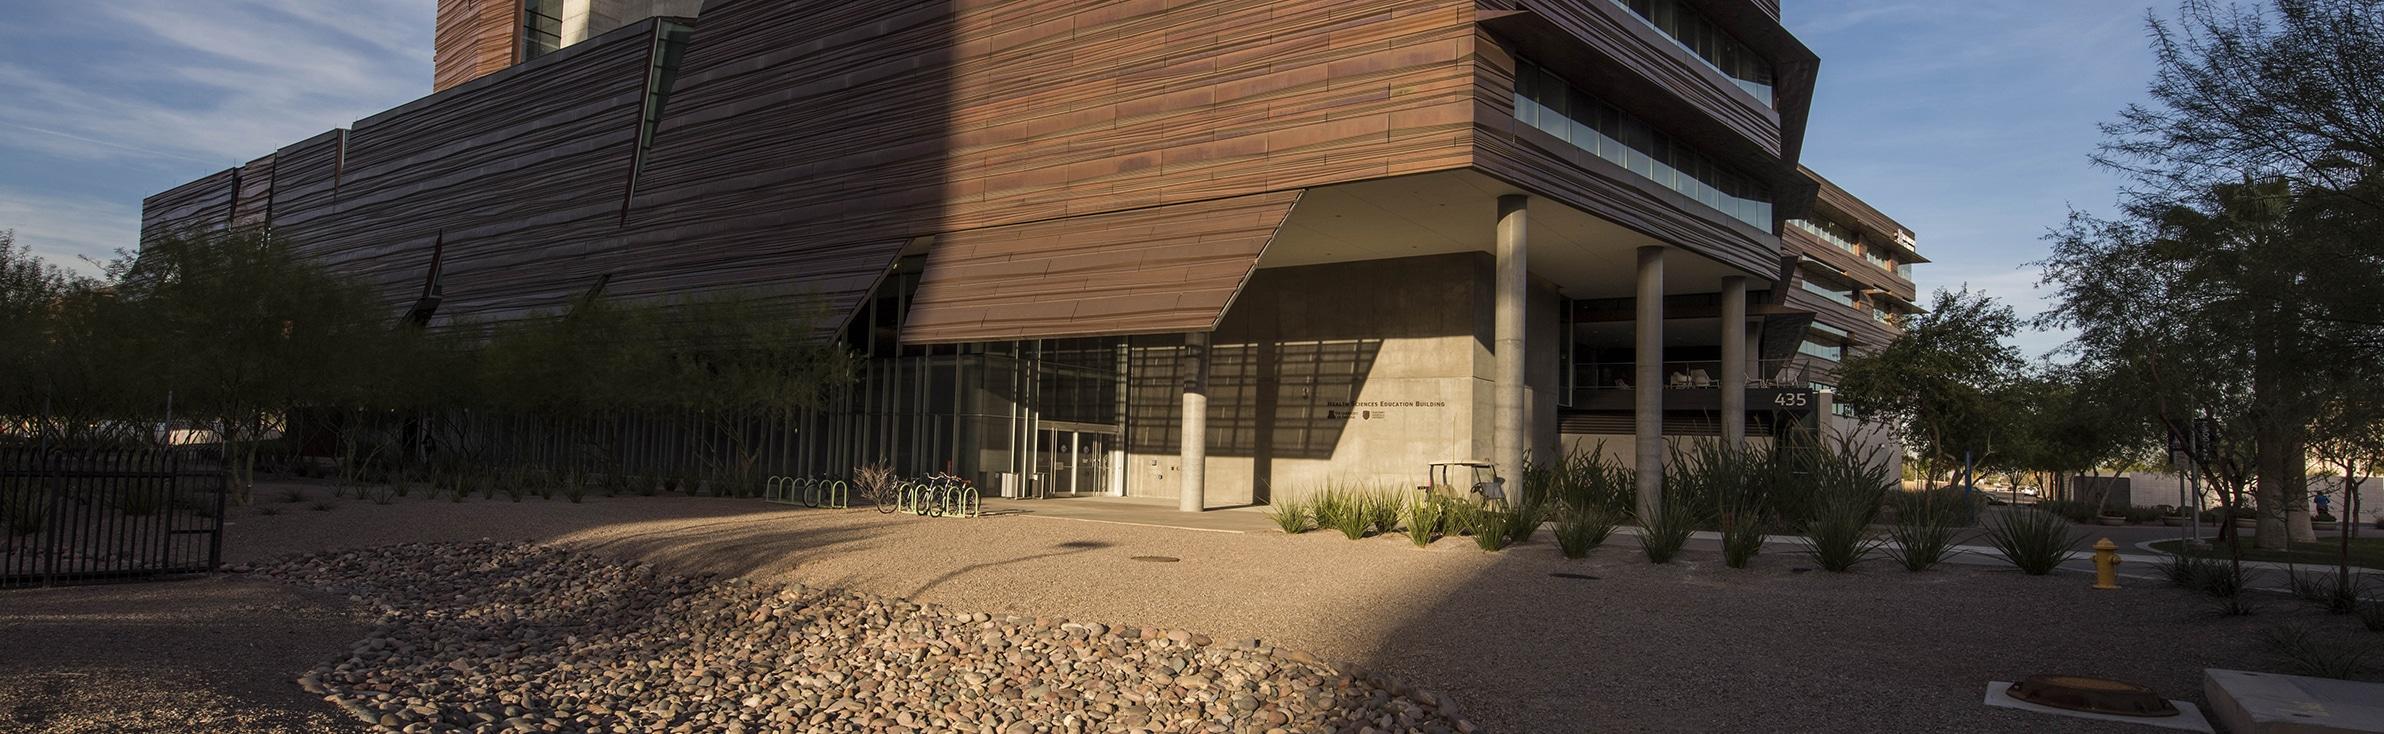 MS Athletic Training at PBC | Phoenix Biomedical Campus